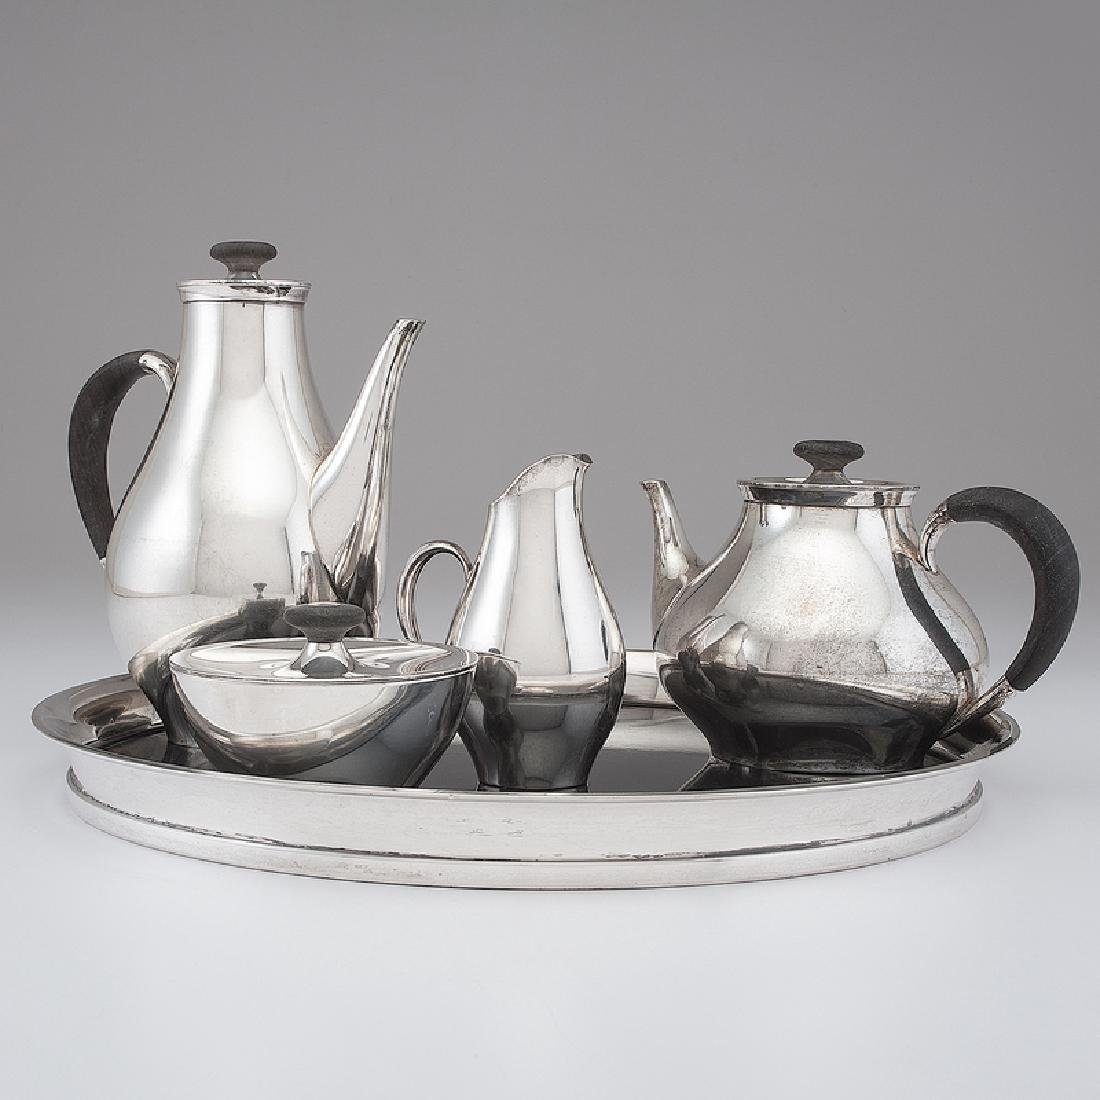 Gorham Modernist Sterling Tea & Coffee Service